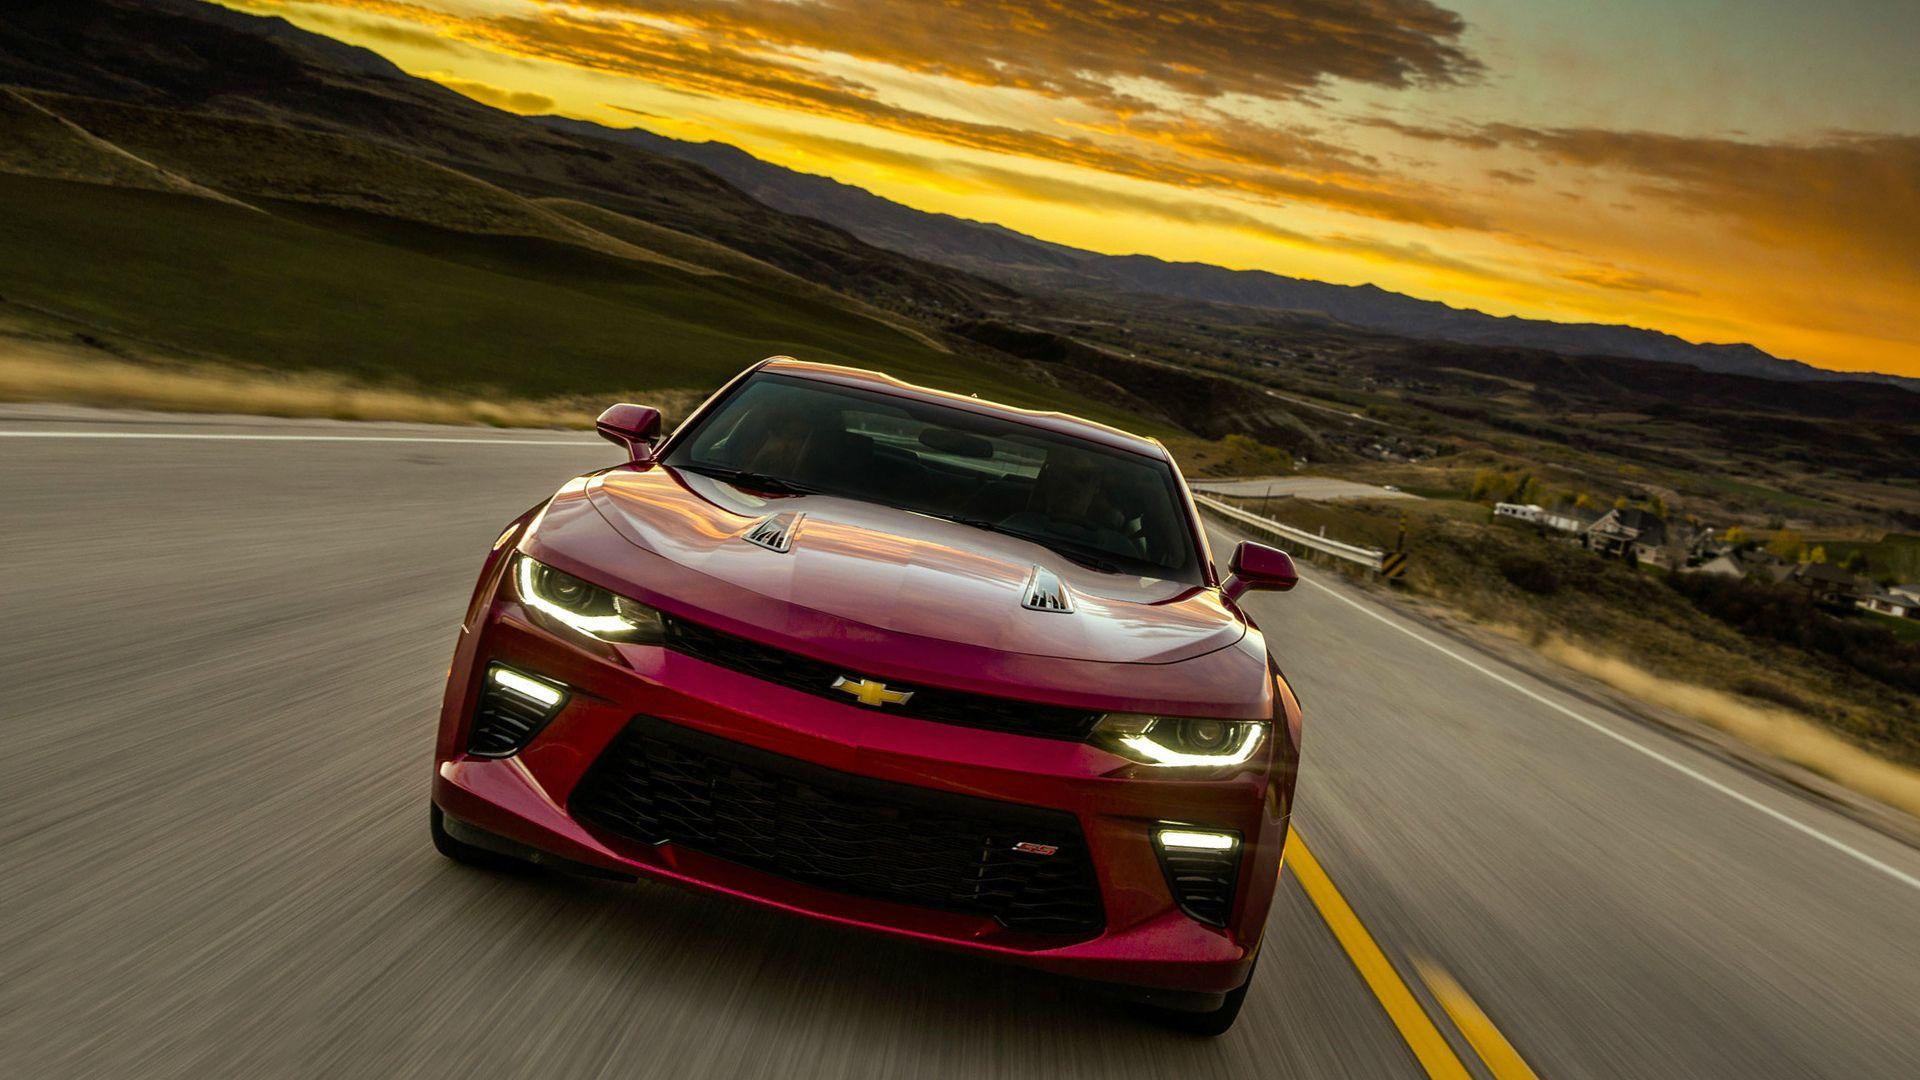 Camaro HD Car Wallpapers New Tab Theme - Top Speed Motors